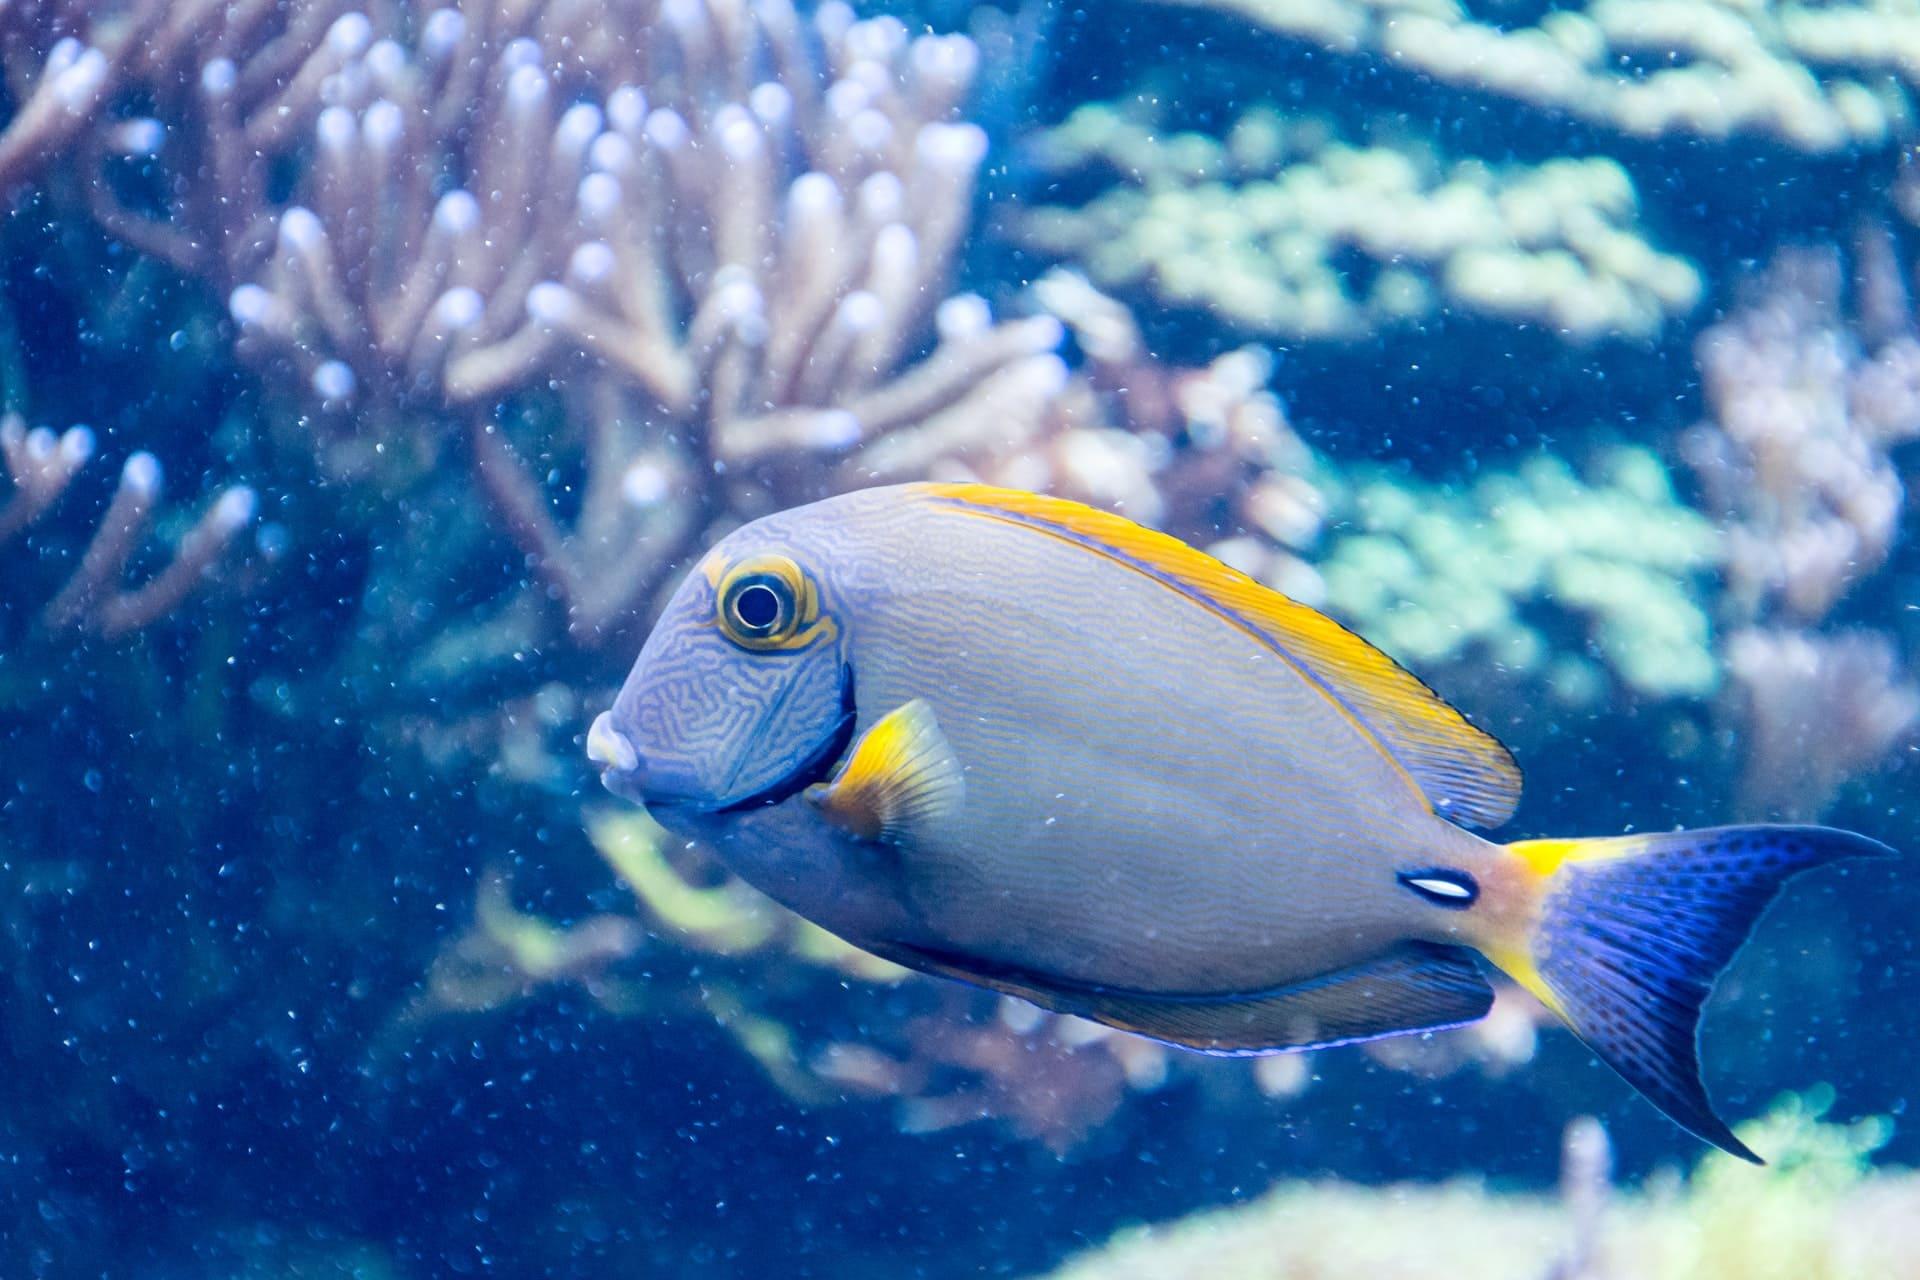 blue and yellow salt fish